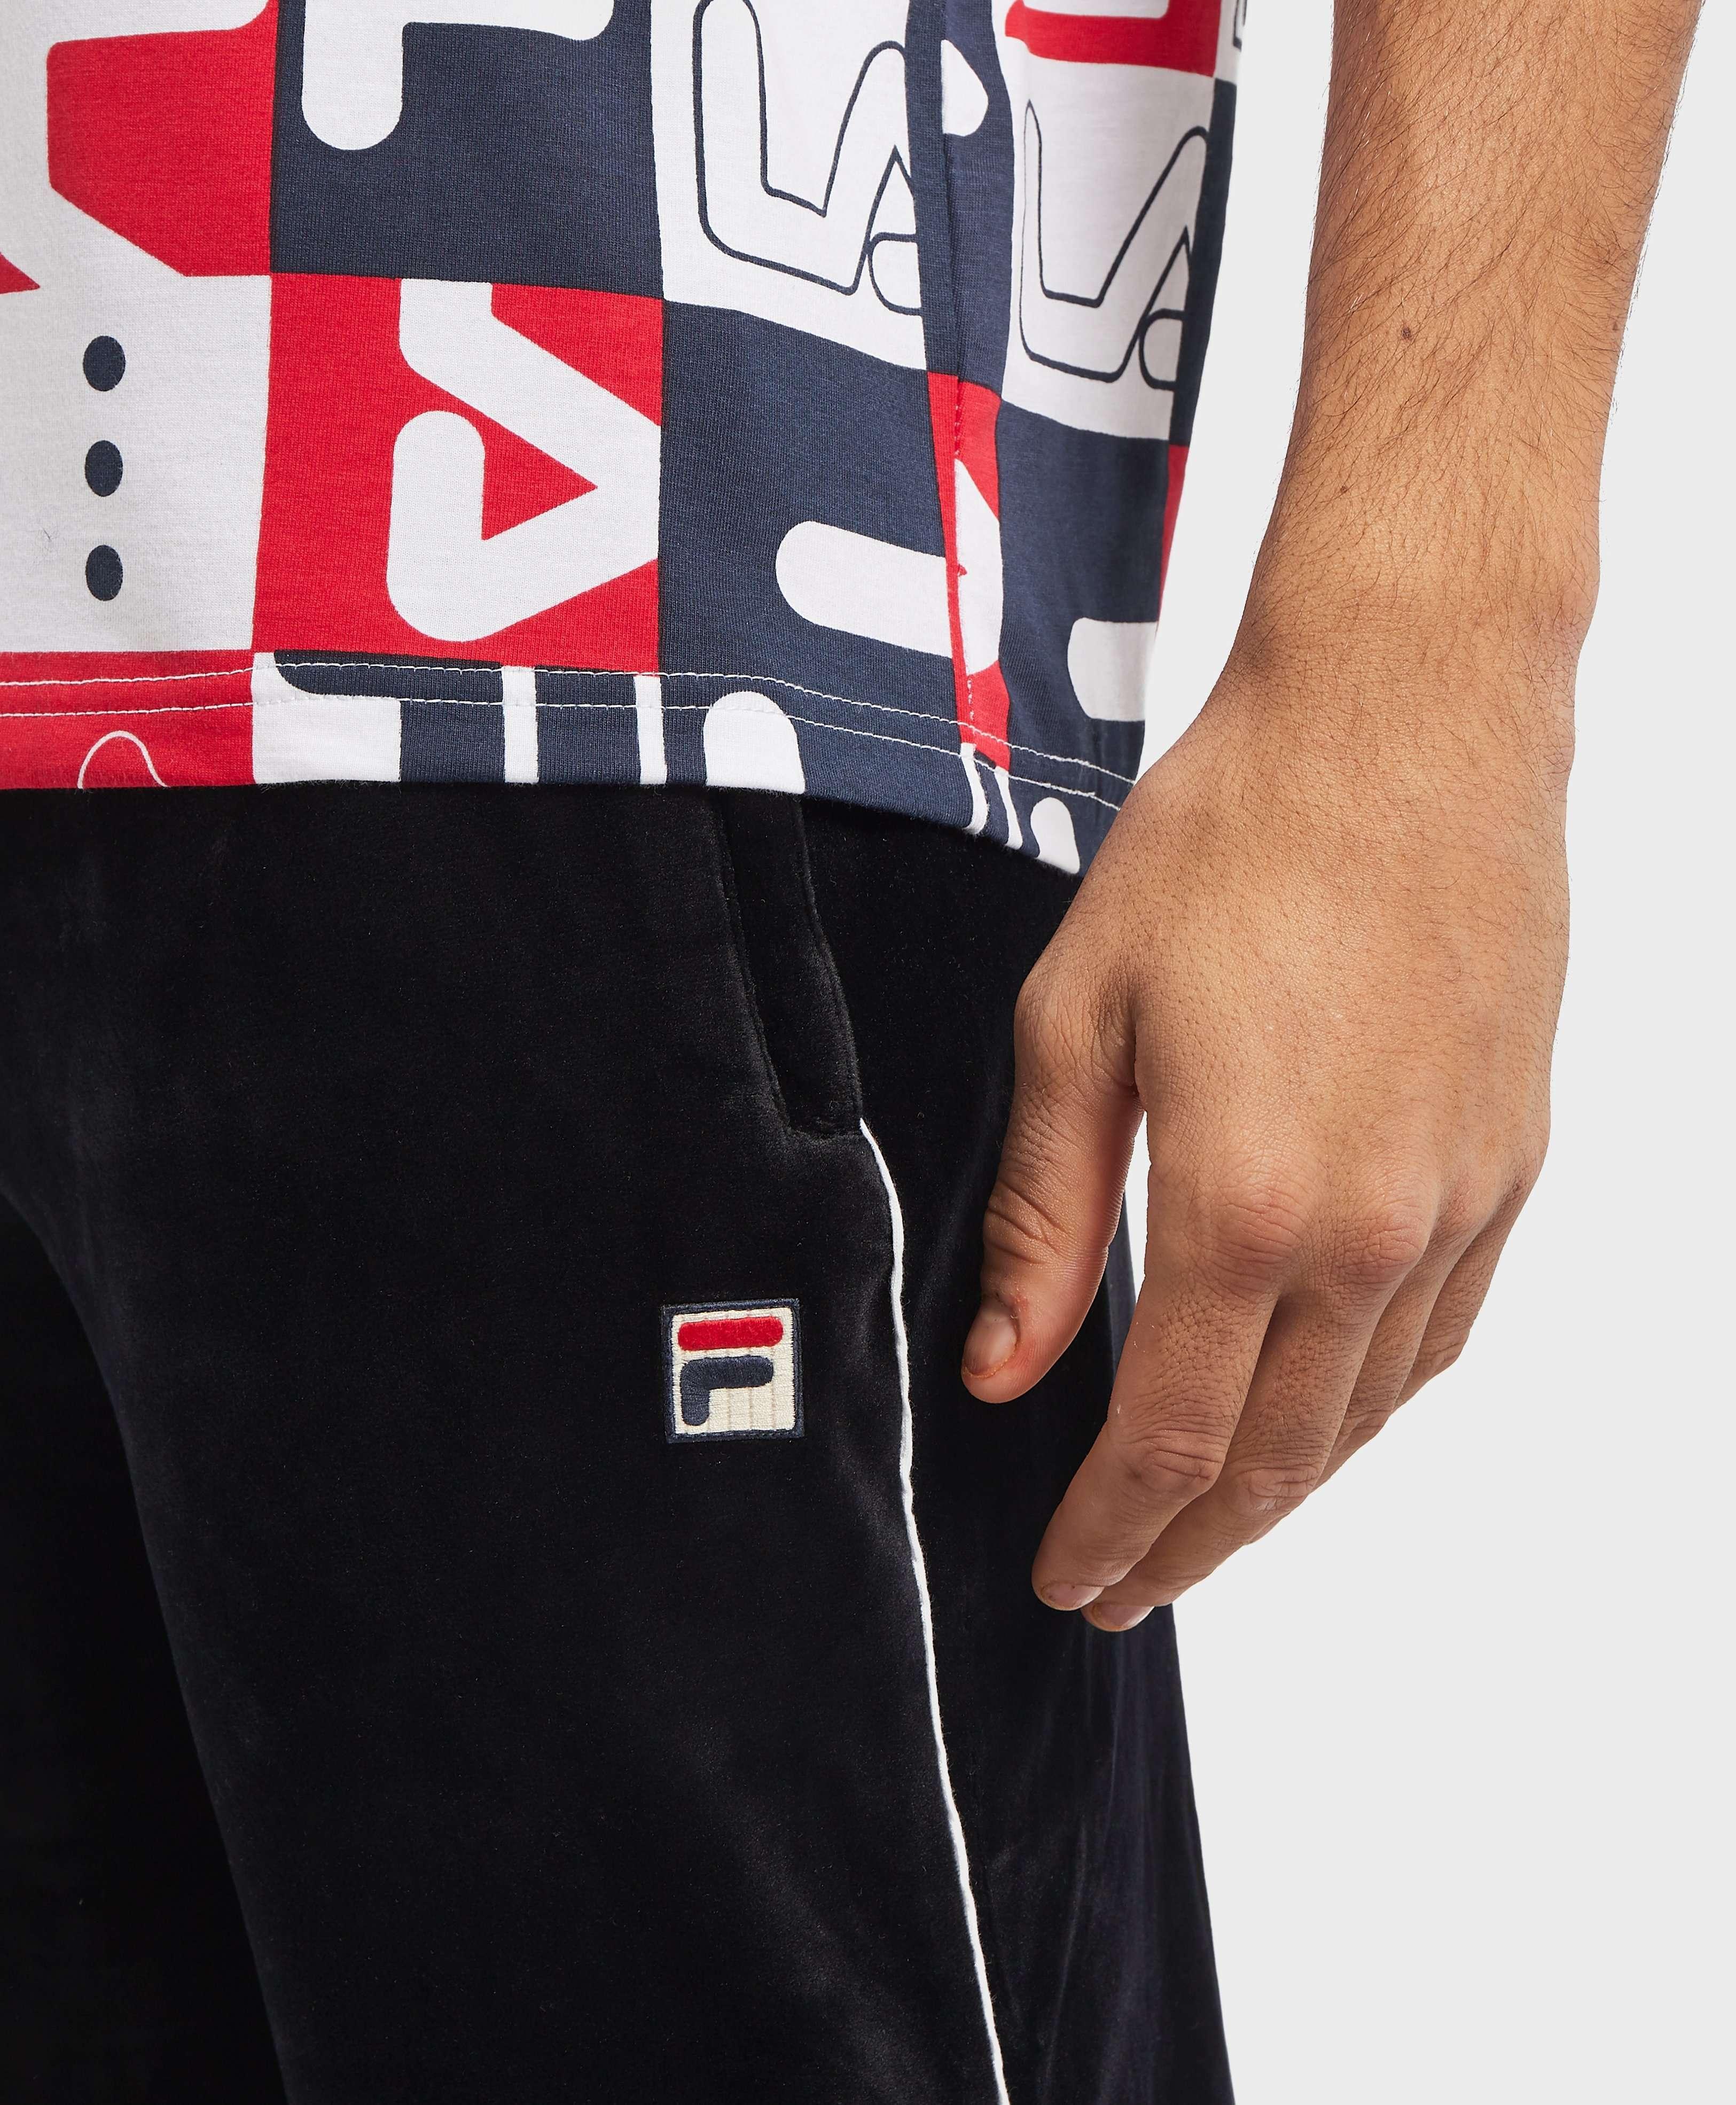 Fila Velour Track Pants - Online Exclusive